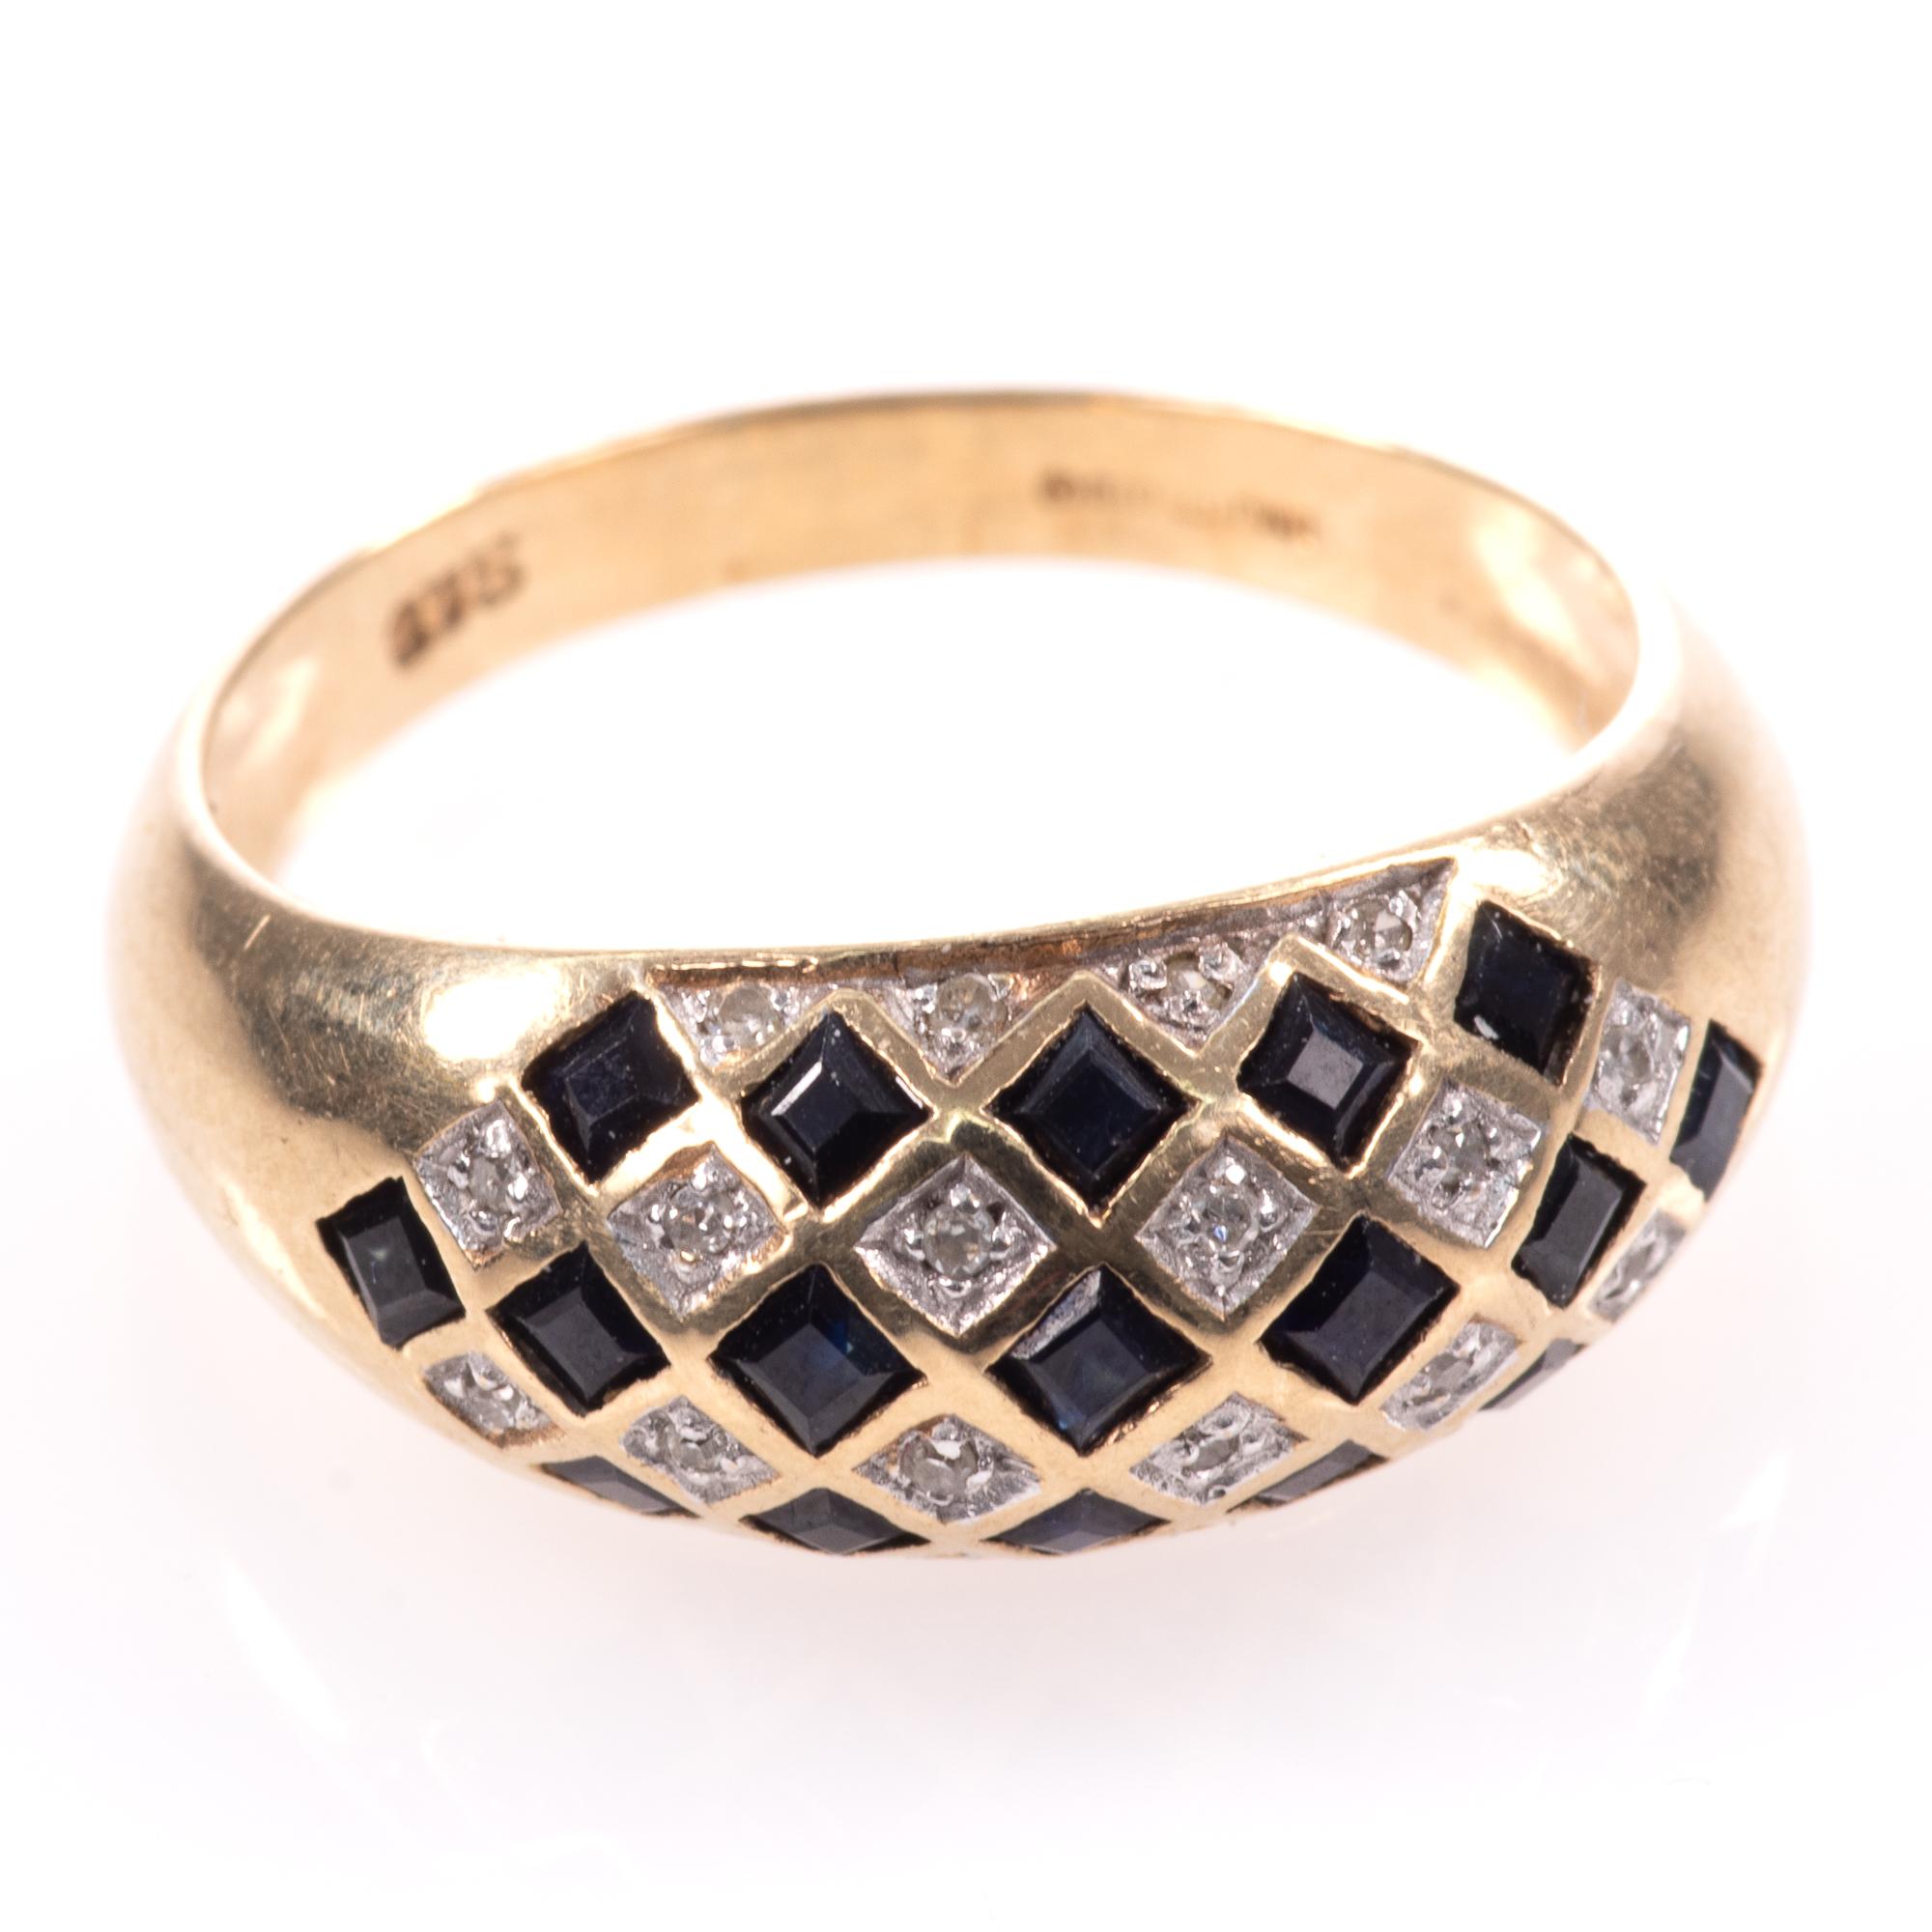 9ct Gold Art Deco Style 0.68ct Sapphire & Diamond Ring - Image 4 of 8